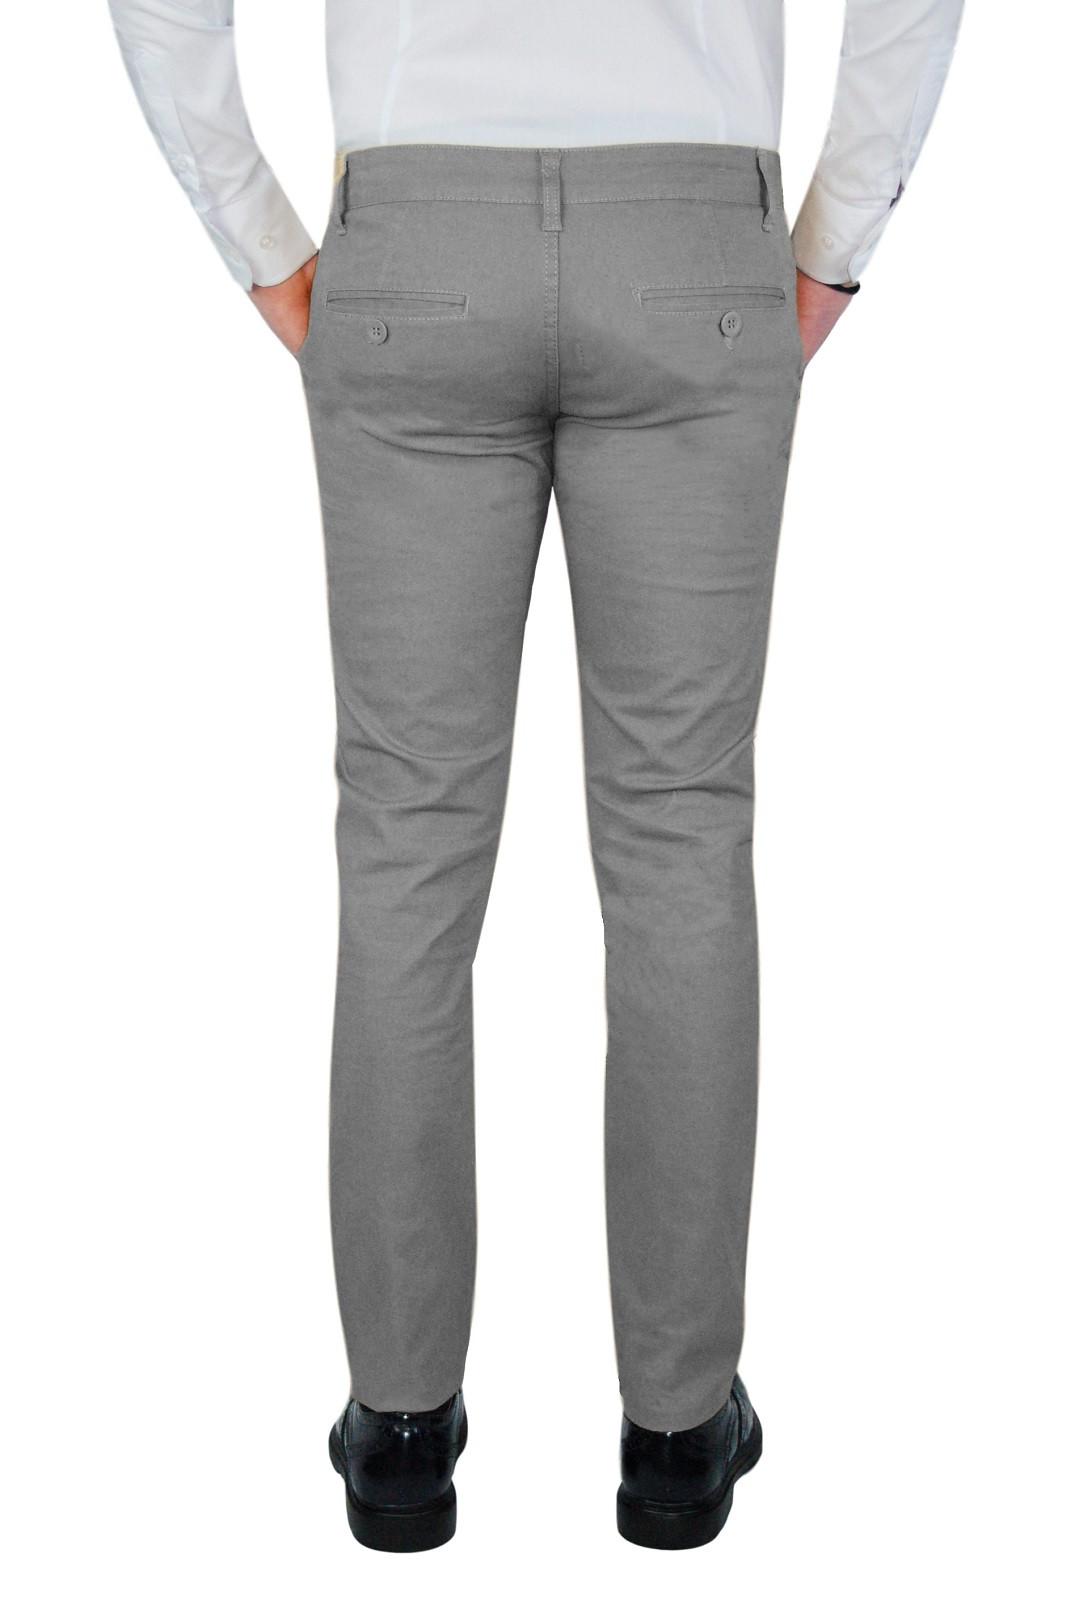 Pantalone-Uomo-Chino-Slim-fit-Primaverile-tasca-america-Bianco-Grigio-Senape-Bei miniatura 20